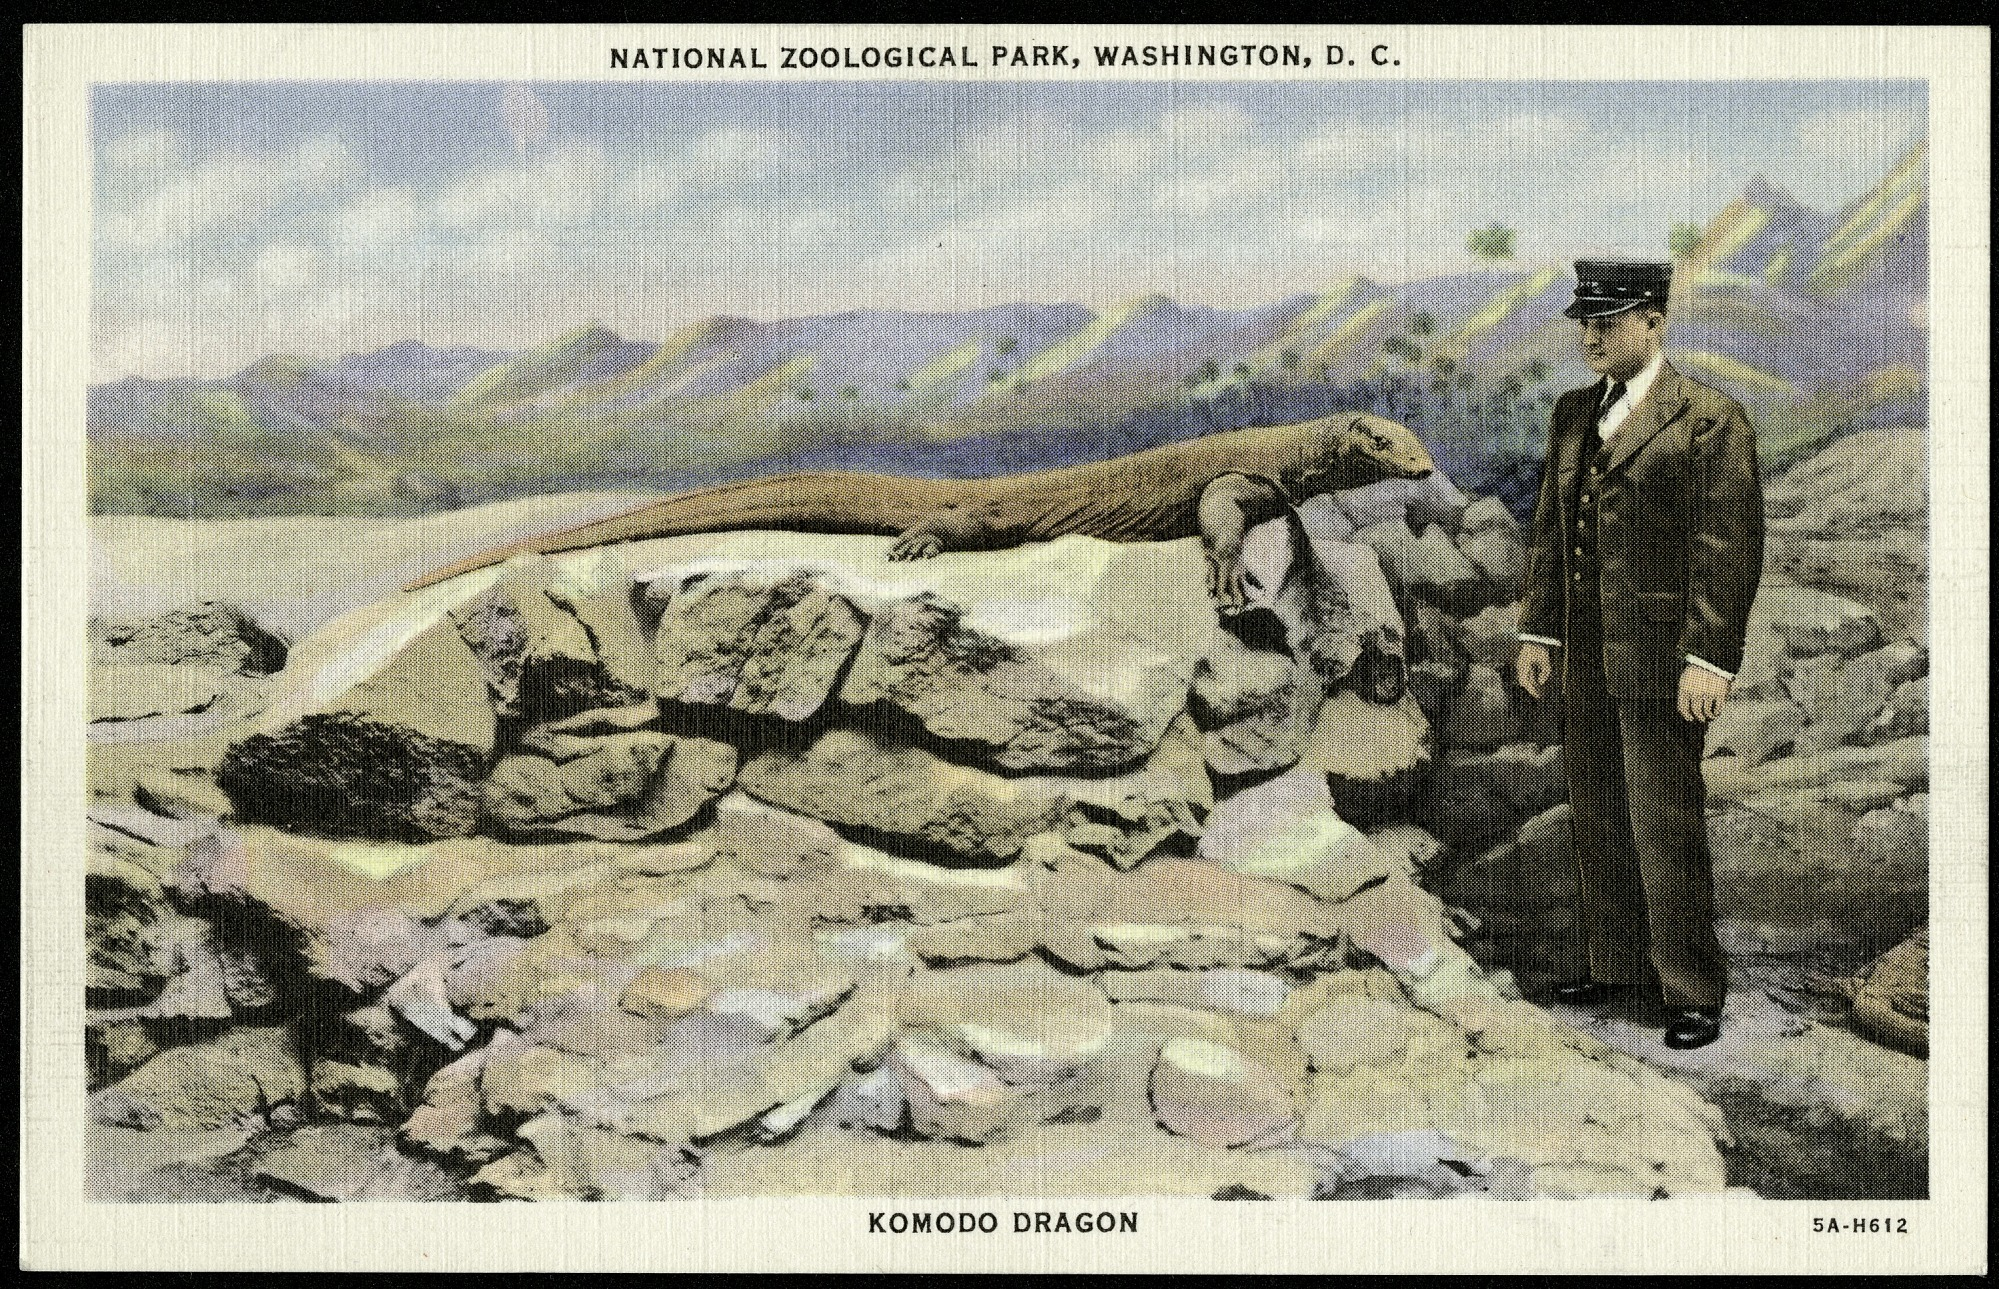 Postcard of a Komodo Dragon